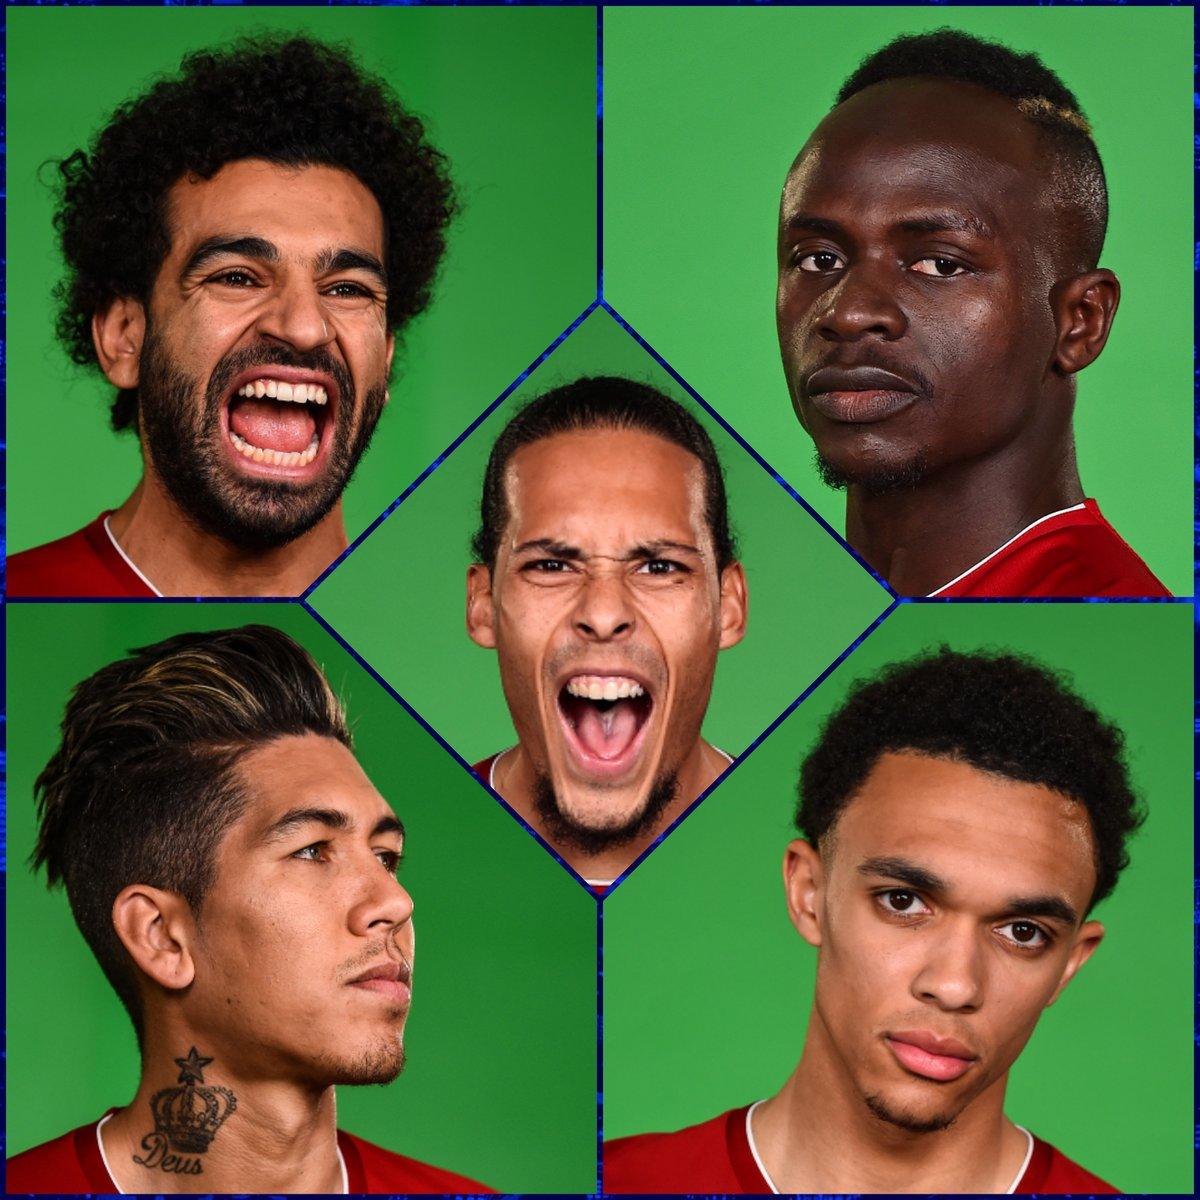 Comienzo de temporada espectacular del Liverpool...🤩  ¿Con cuál de sus estrellas te quedas? 🤩  #UCL | @LFC https://t.co/lm7WAwJAiQ